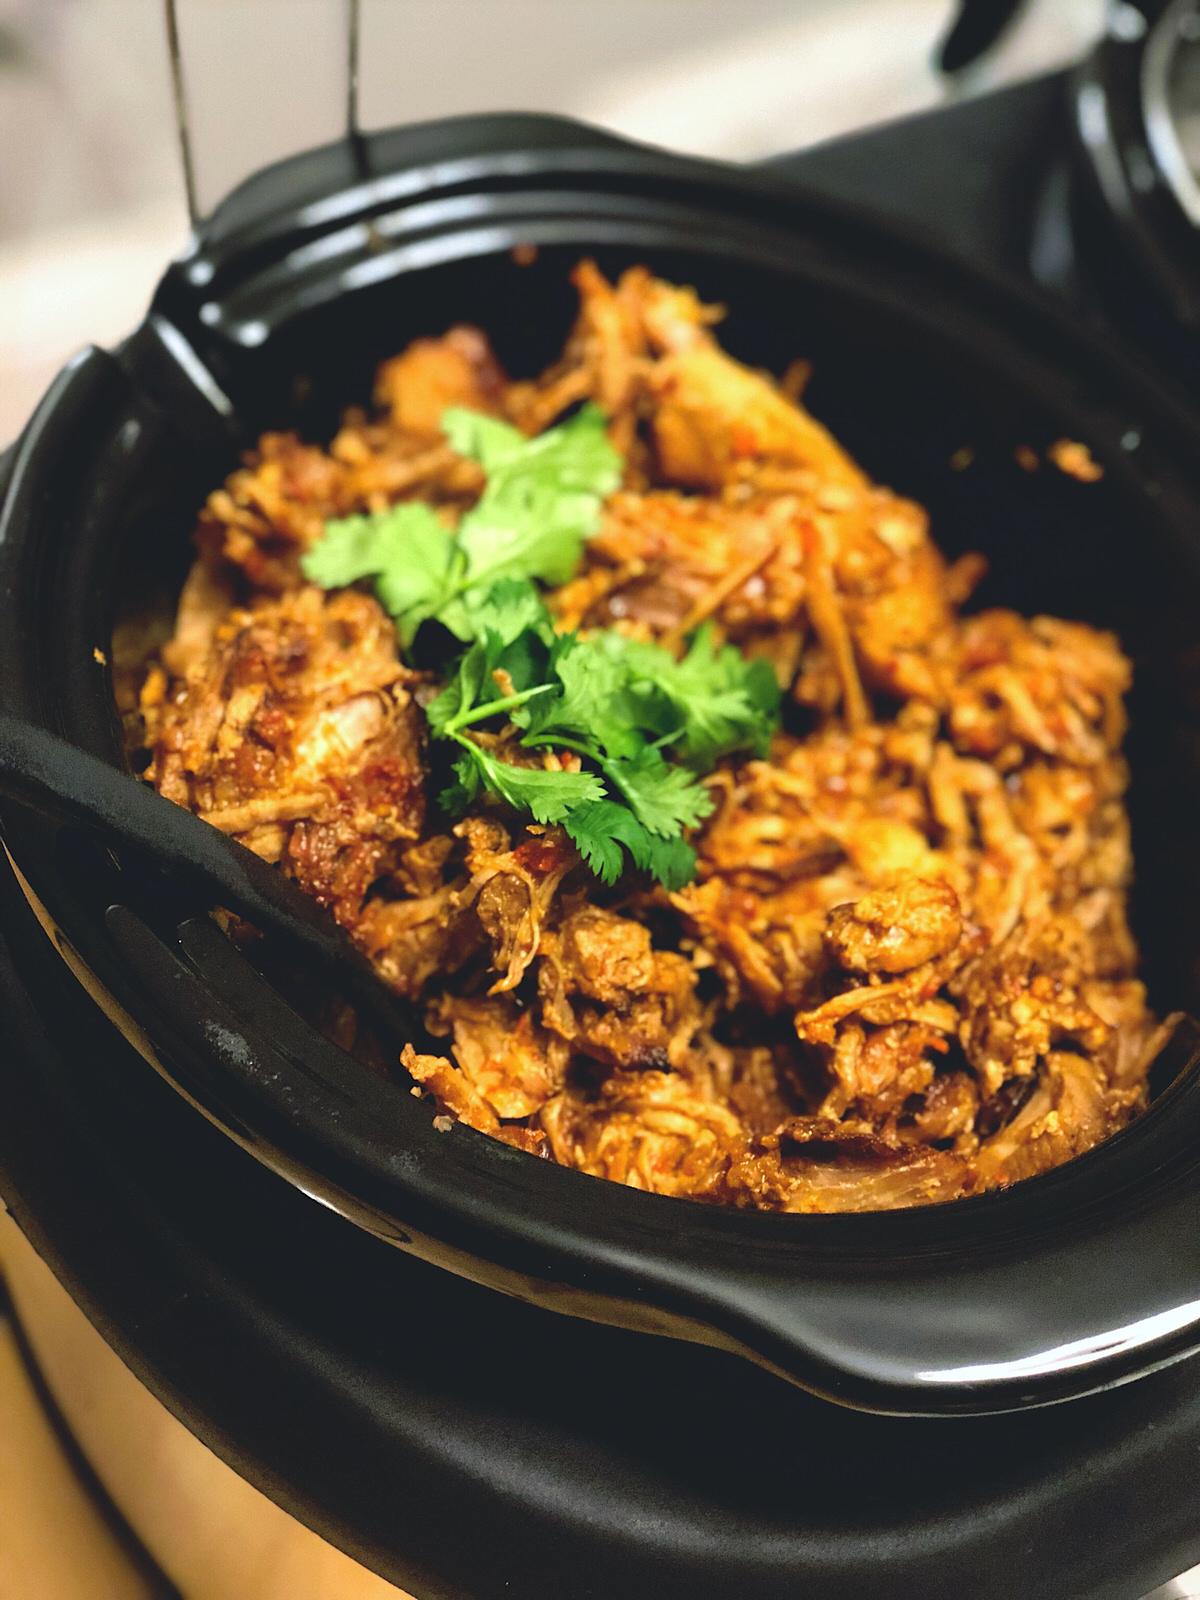 Chicago Apartments, Cinco de Mayo Food, Shredded Chicken Taco Slow Cooker Recipe